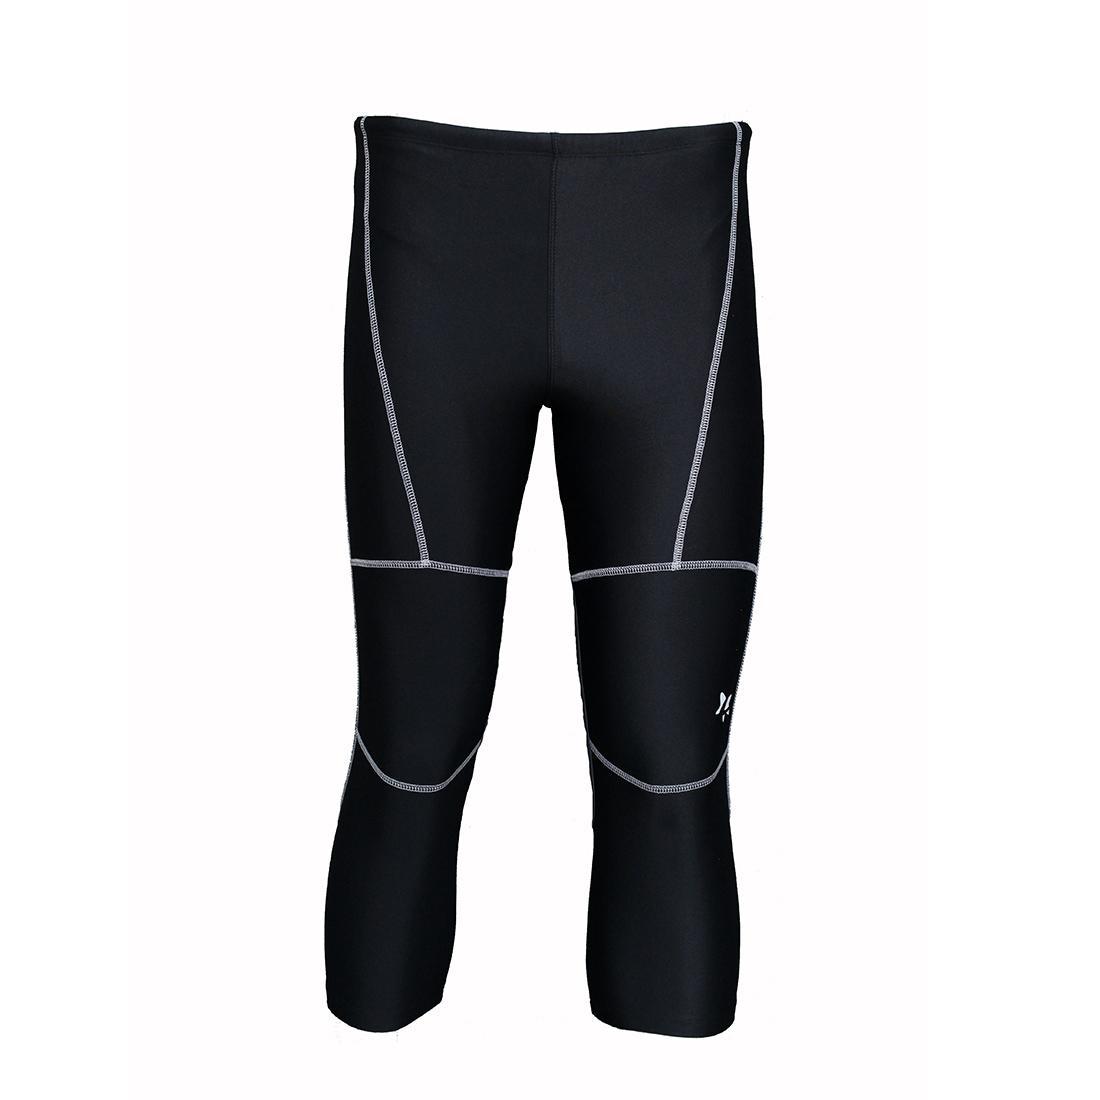 Lasona Celana Renang Panjang Pria CRL-899-L4 Black Dim grey